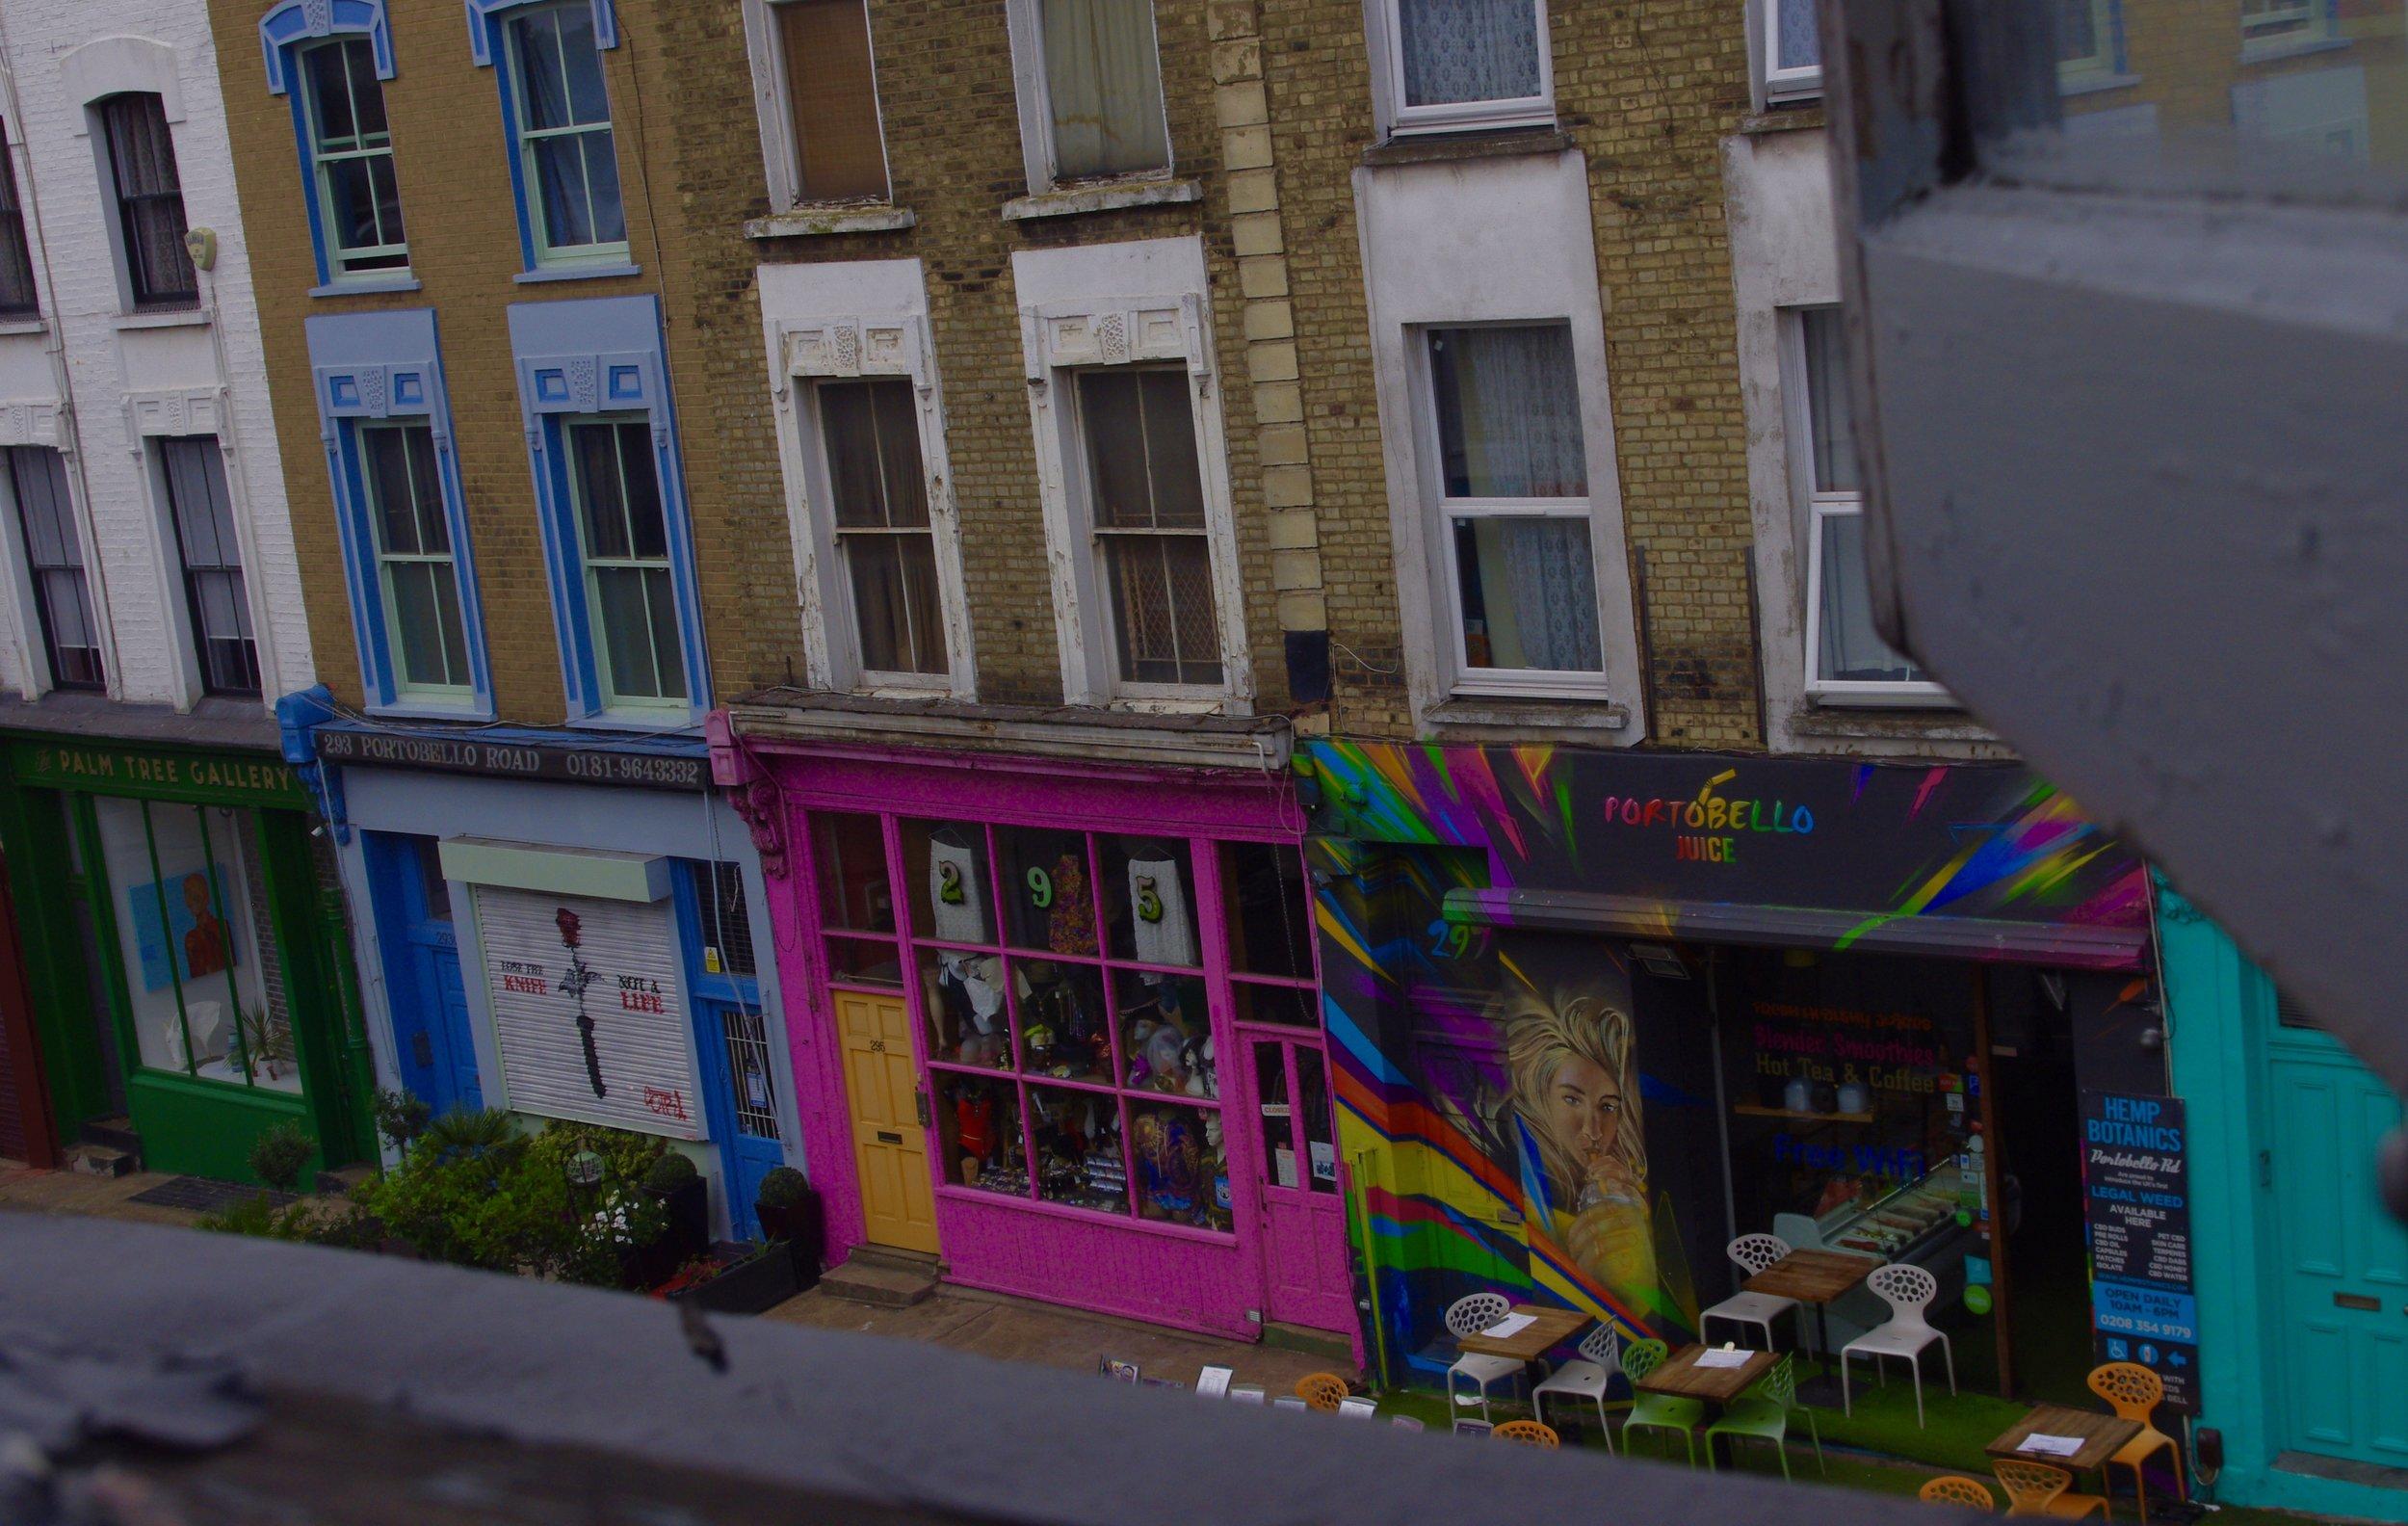 Portobella Rd, Notting Hill